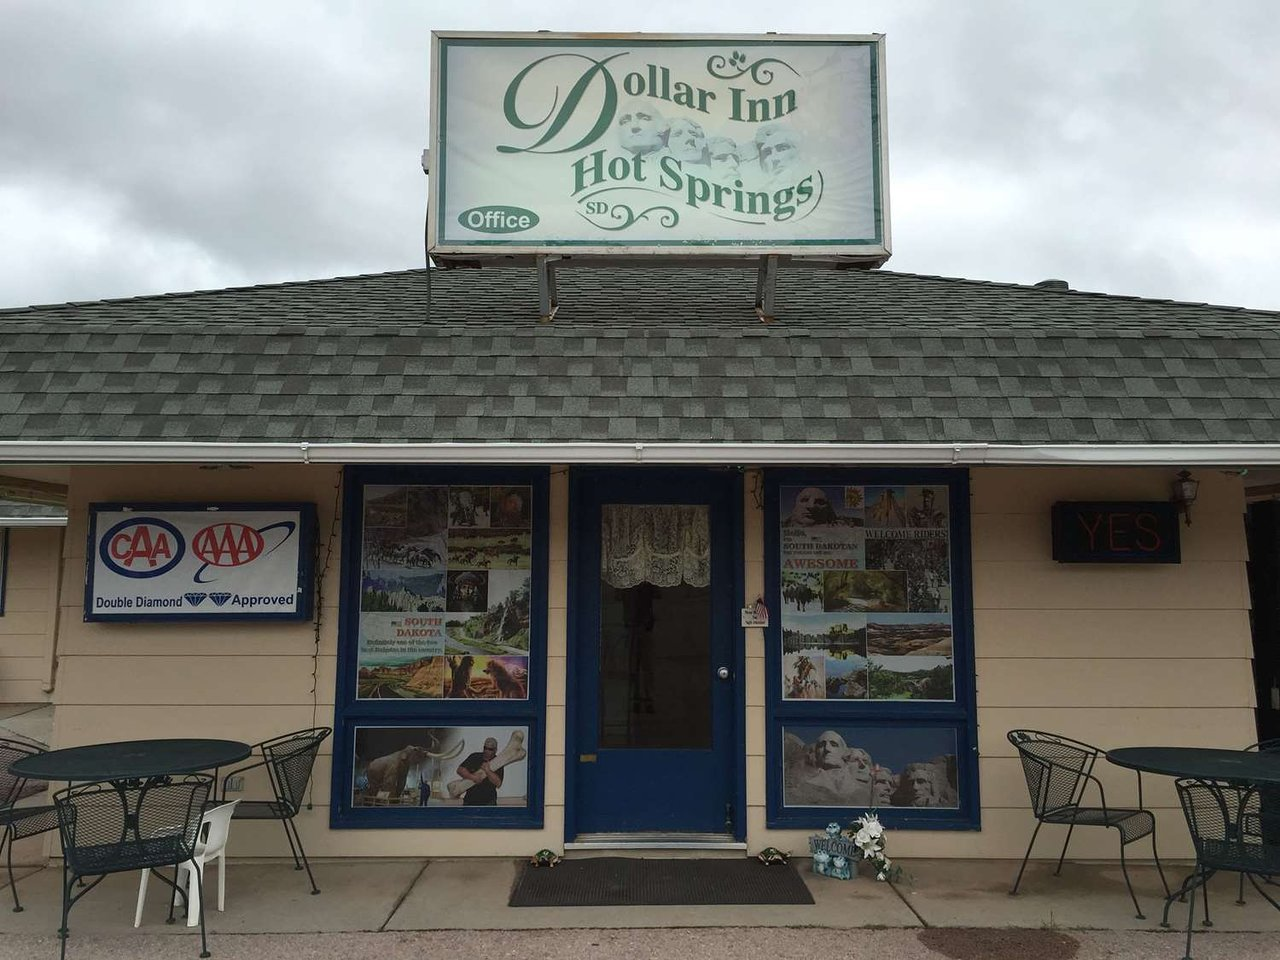 dollar inn hot springs 54 9 8 prices hotel reviews sd rh tripadvisor com